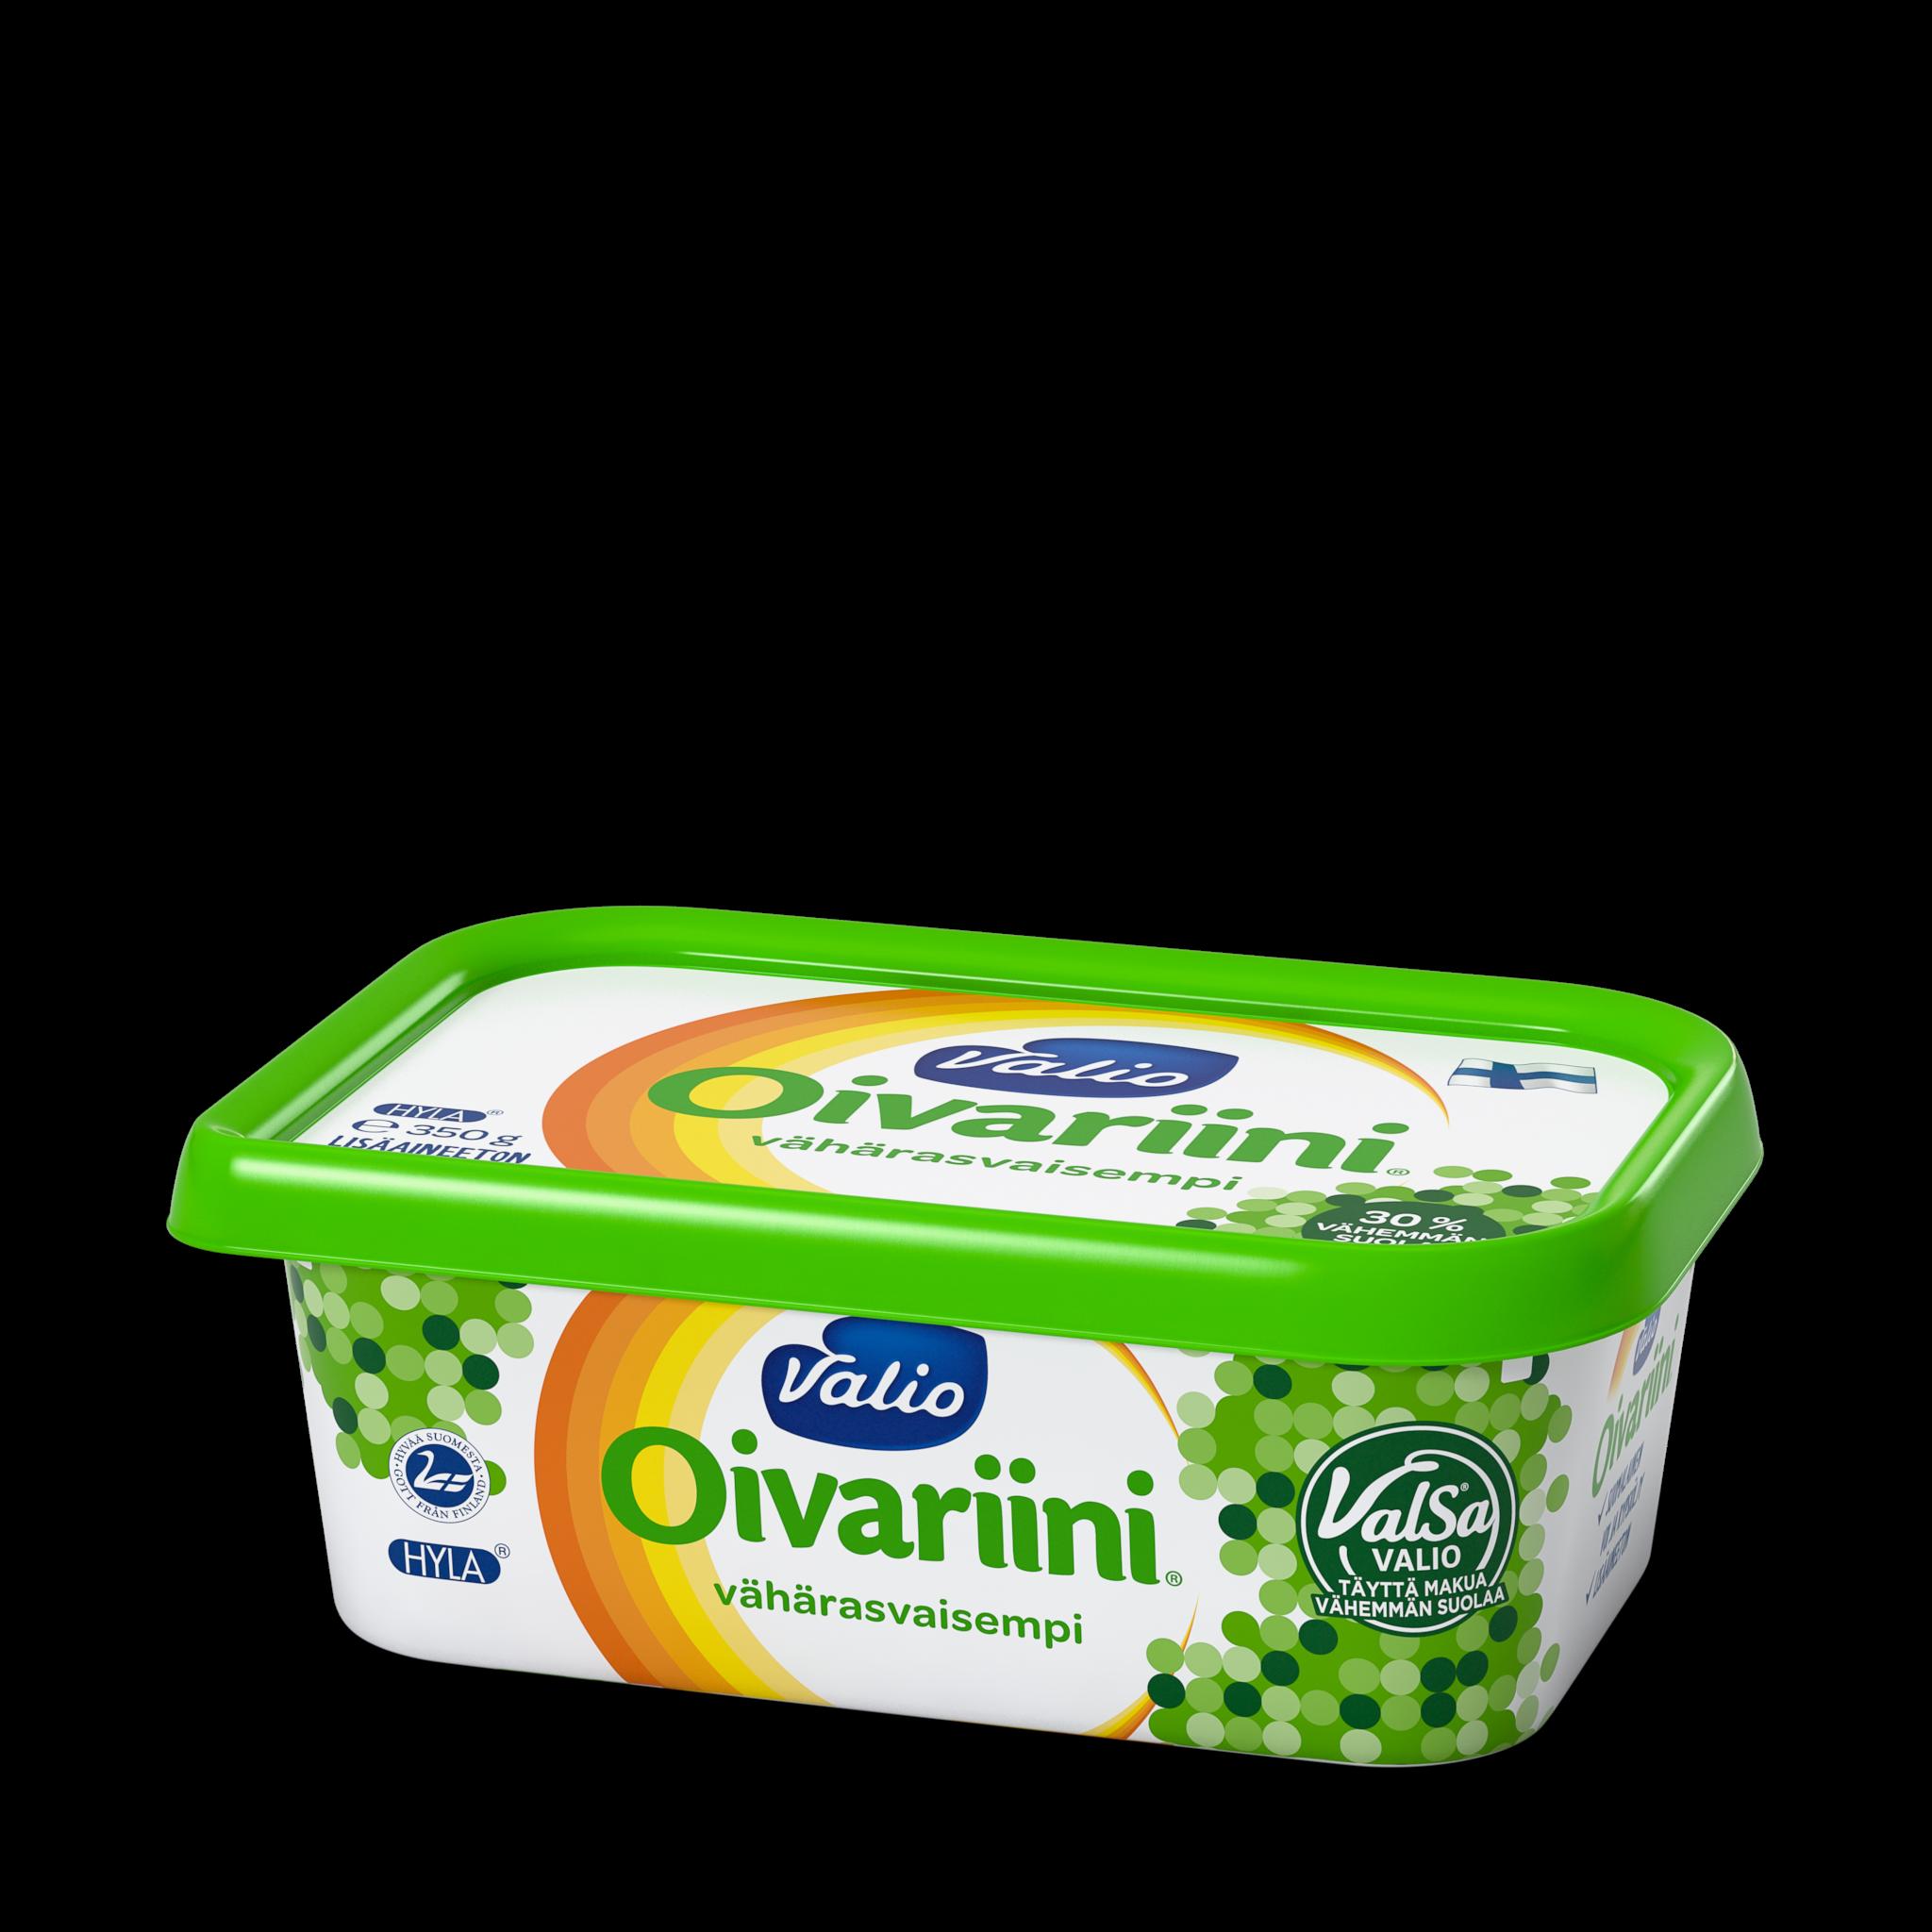 Valio Oivariini® vähärasvaisempi ValSa® HYLA®